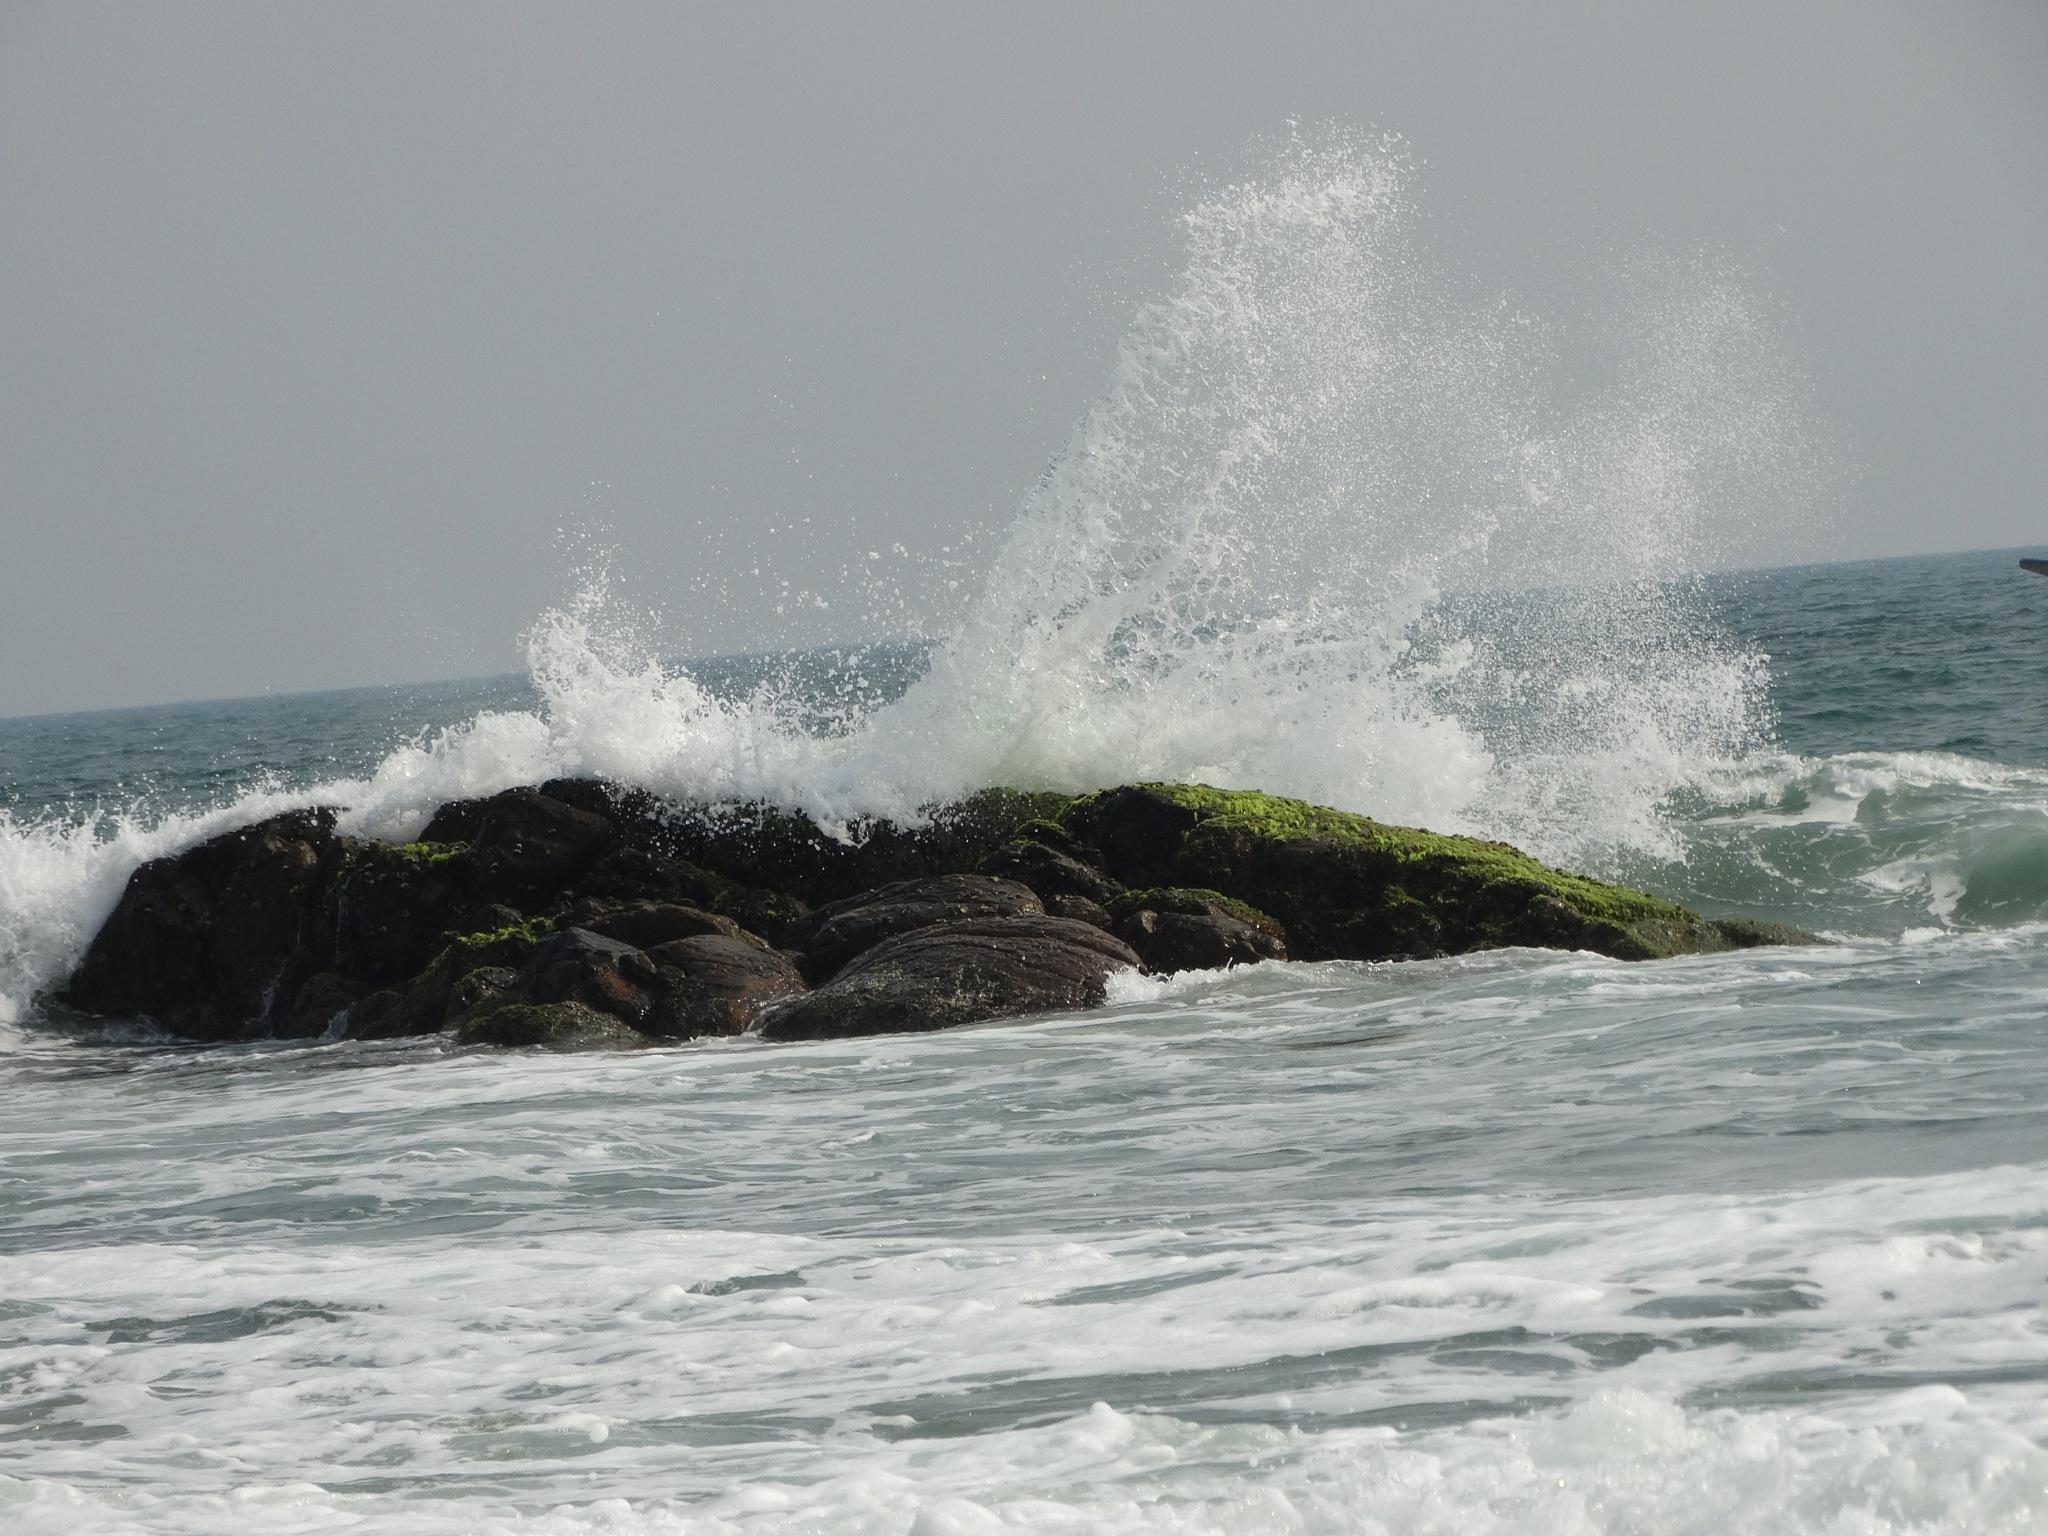 SeaShore by Sandeep Sandy